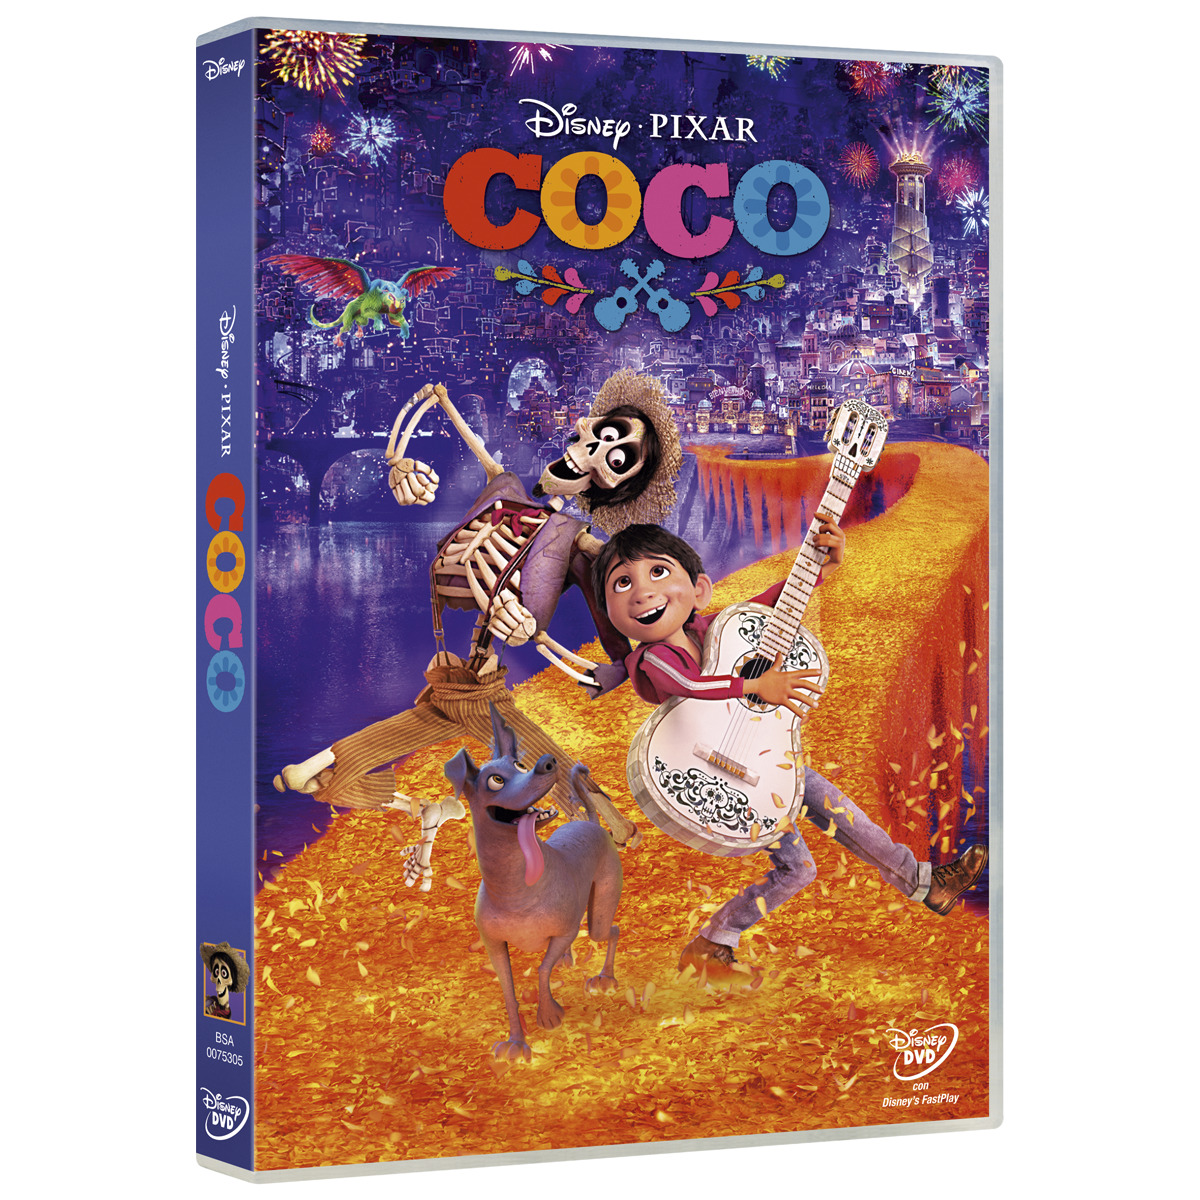 http://www.toledo.es/wp-content/uploads/2018/05/coco-pixar.jpg. DVD INFANTIL JULIO 2018